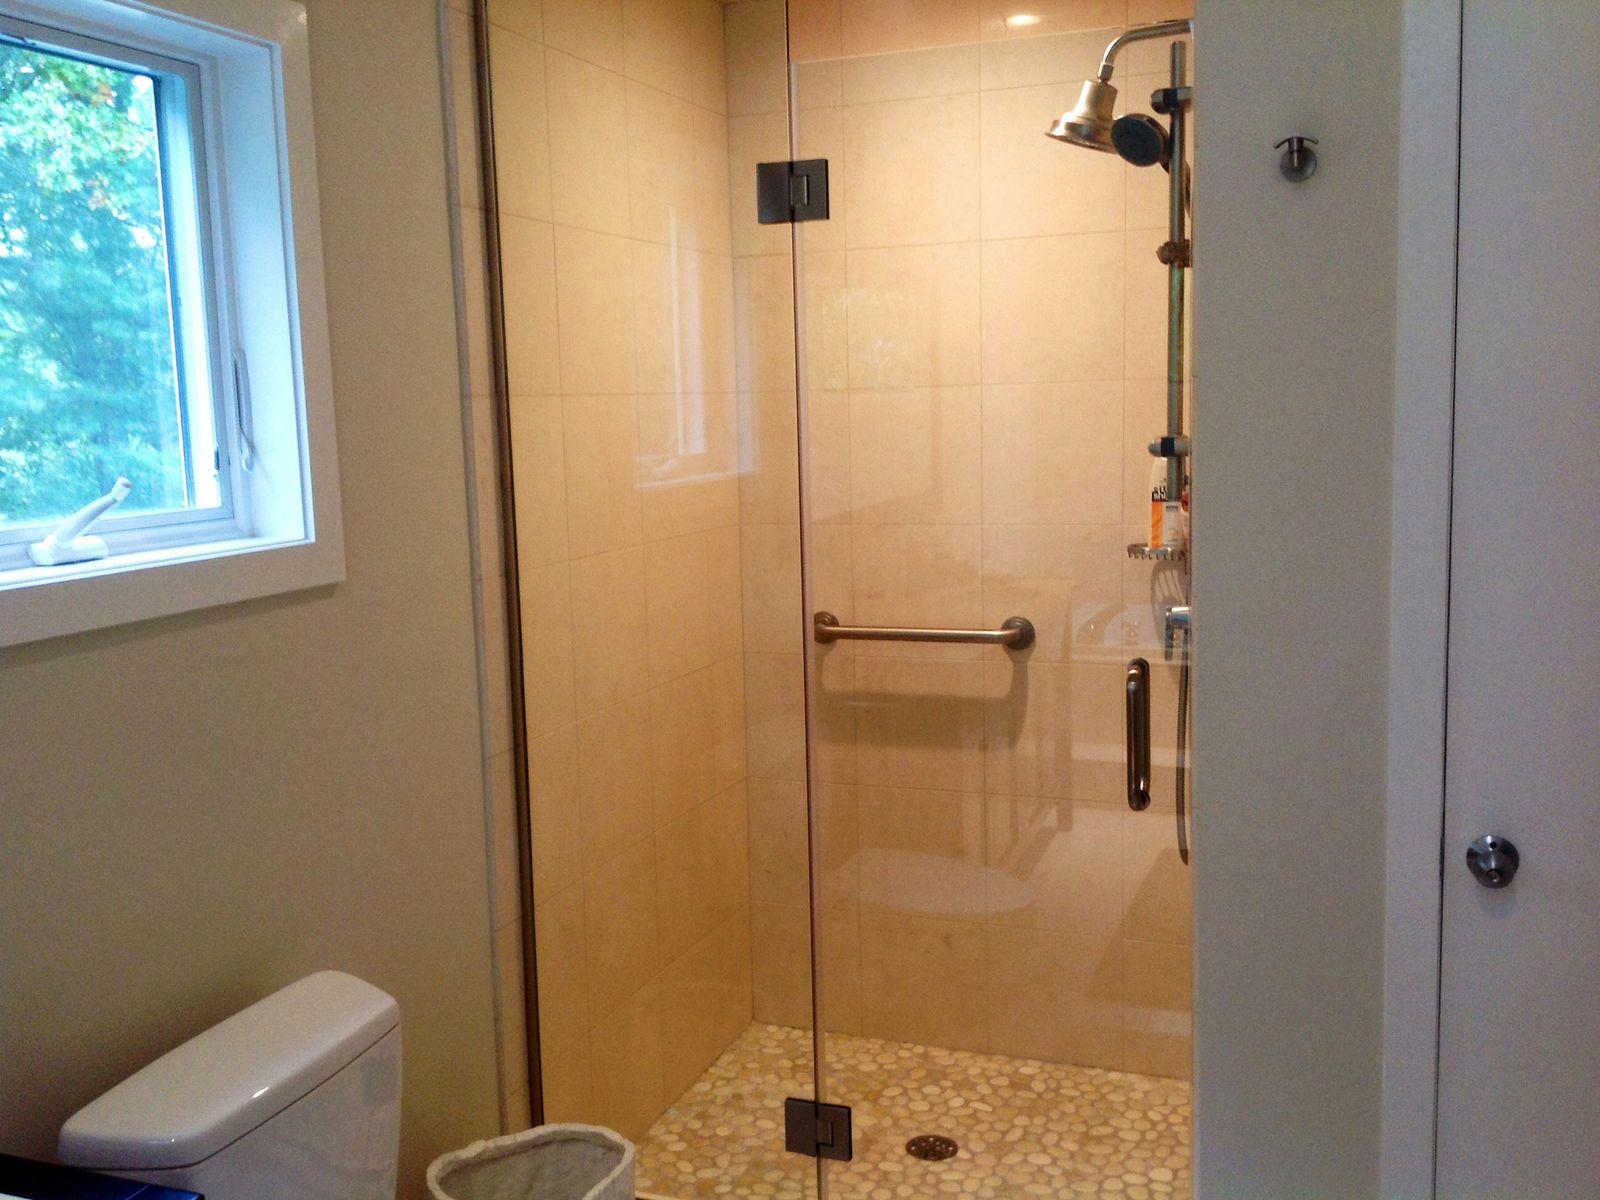 Pebble surface shower